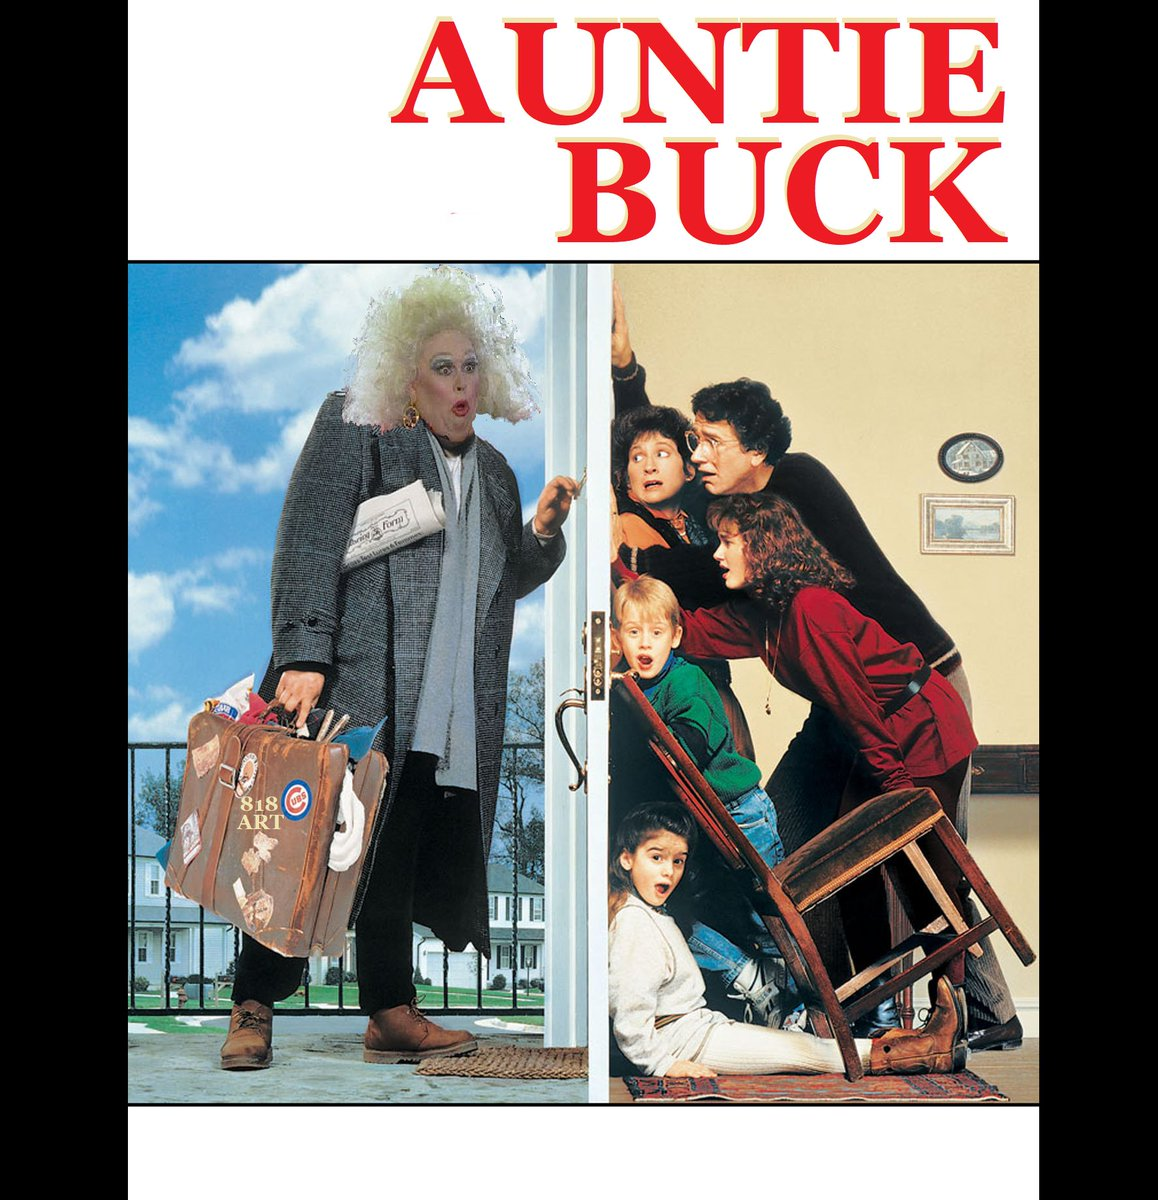 #OppositeAMovieSweeps Auntie Buck  #hashtag